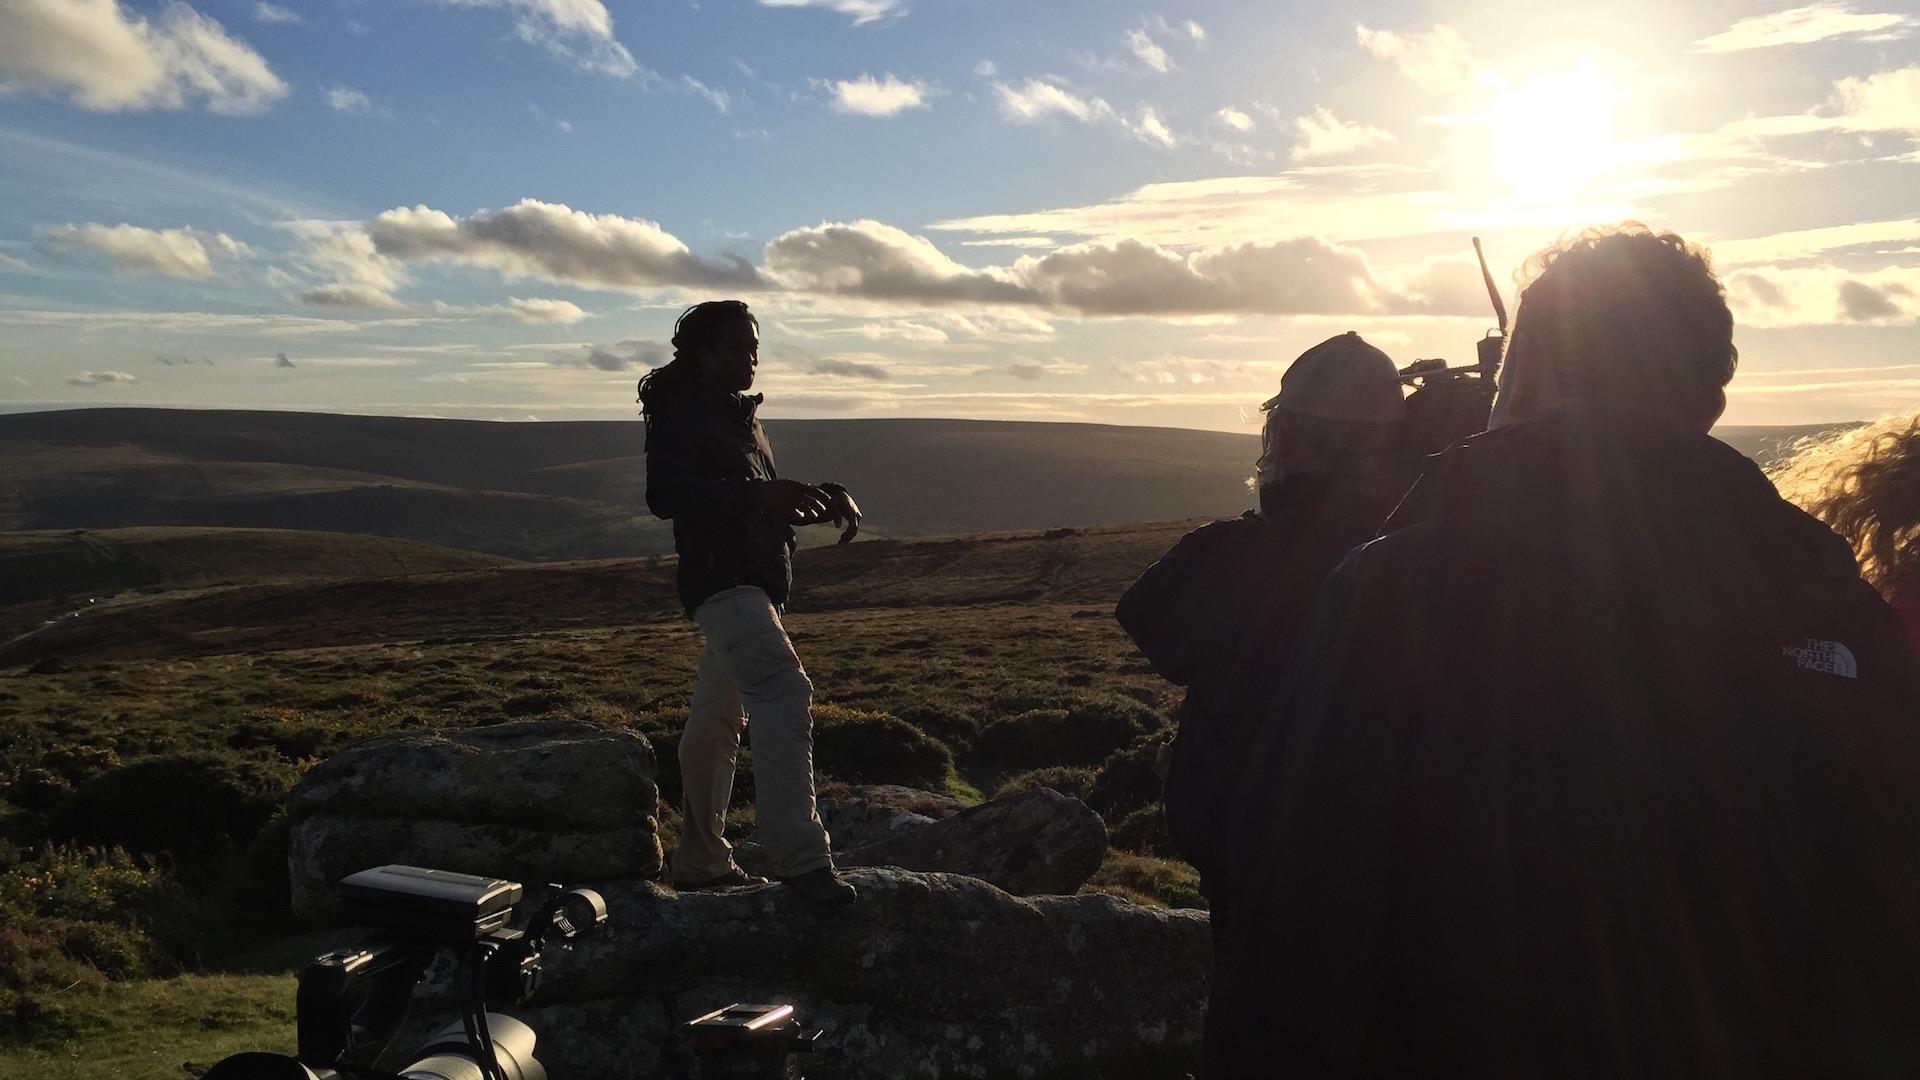 Presenter Nigel Clarke on set of 'The Good Dinosaur - Access All Areas' Filmed in Dartmoor